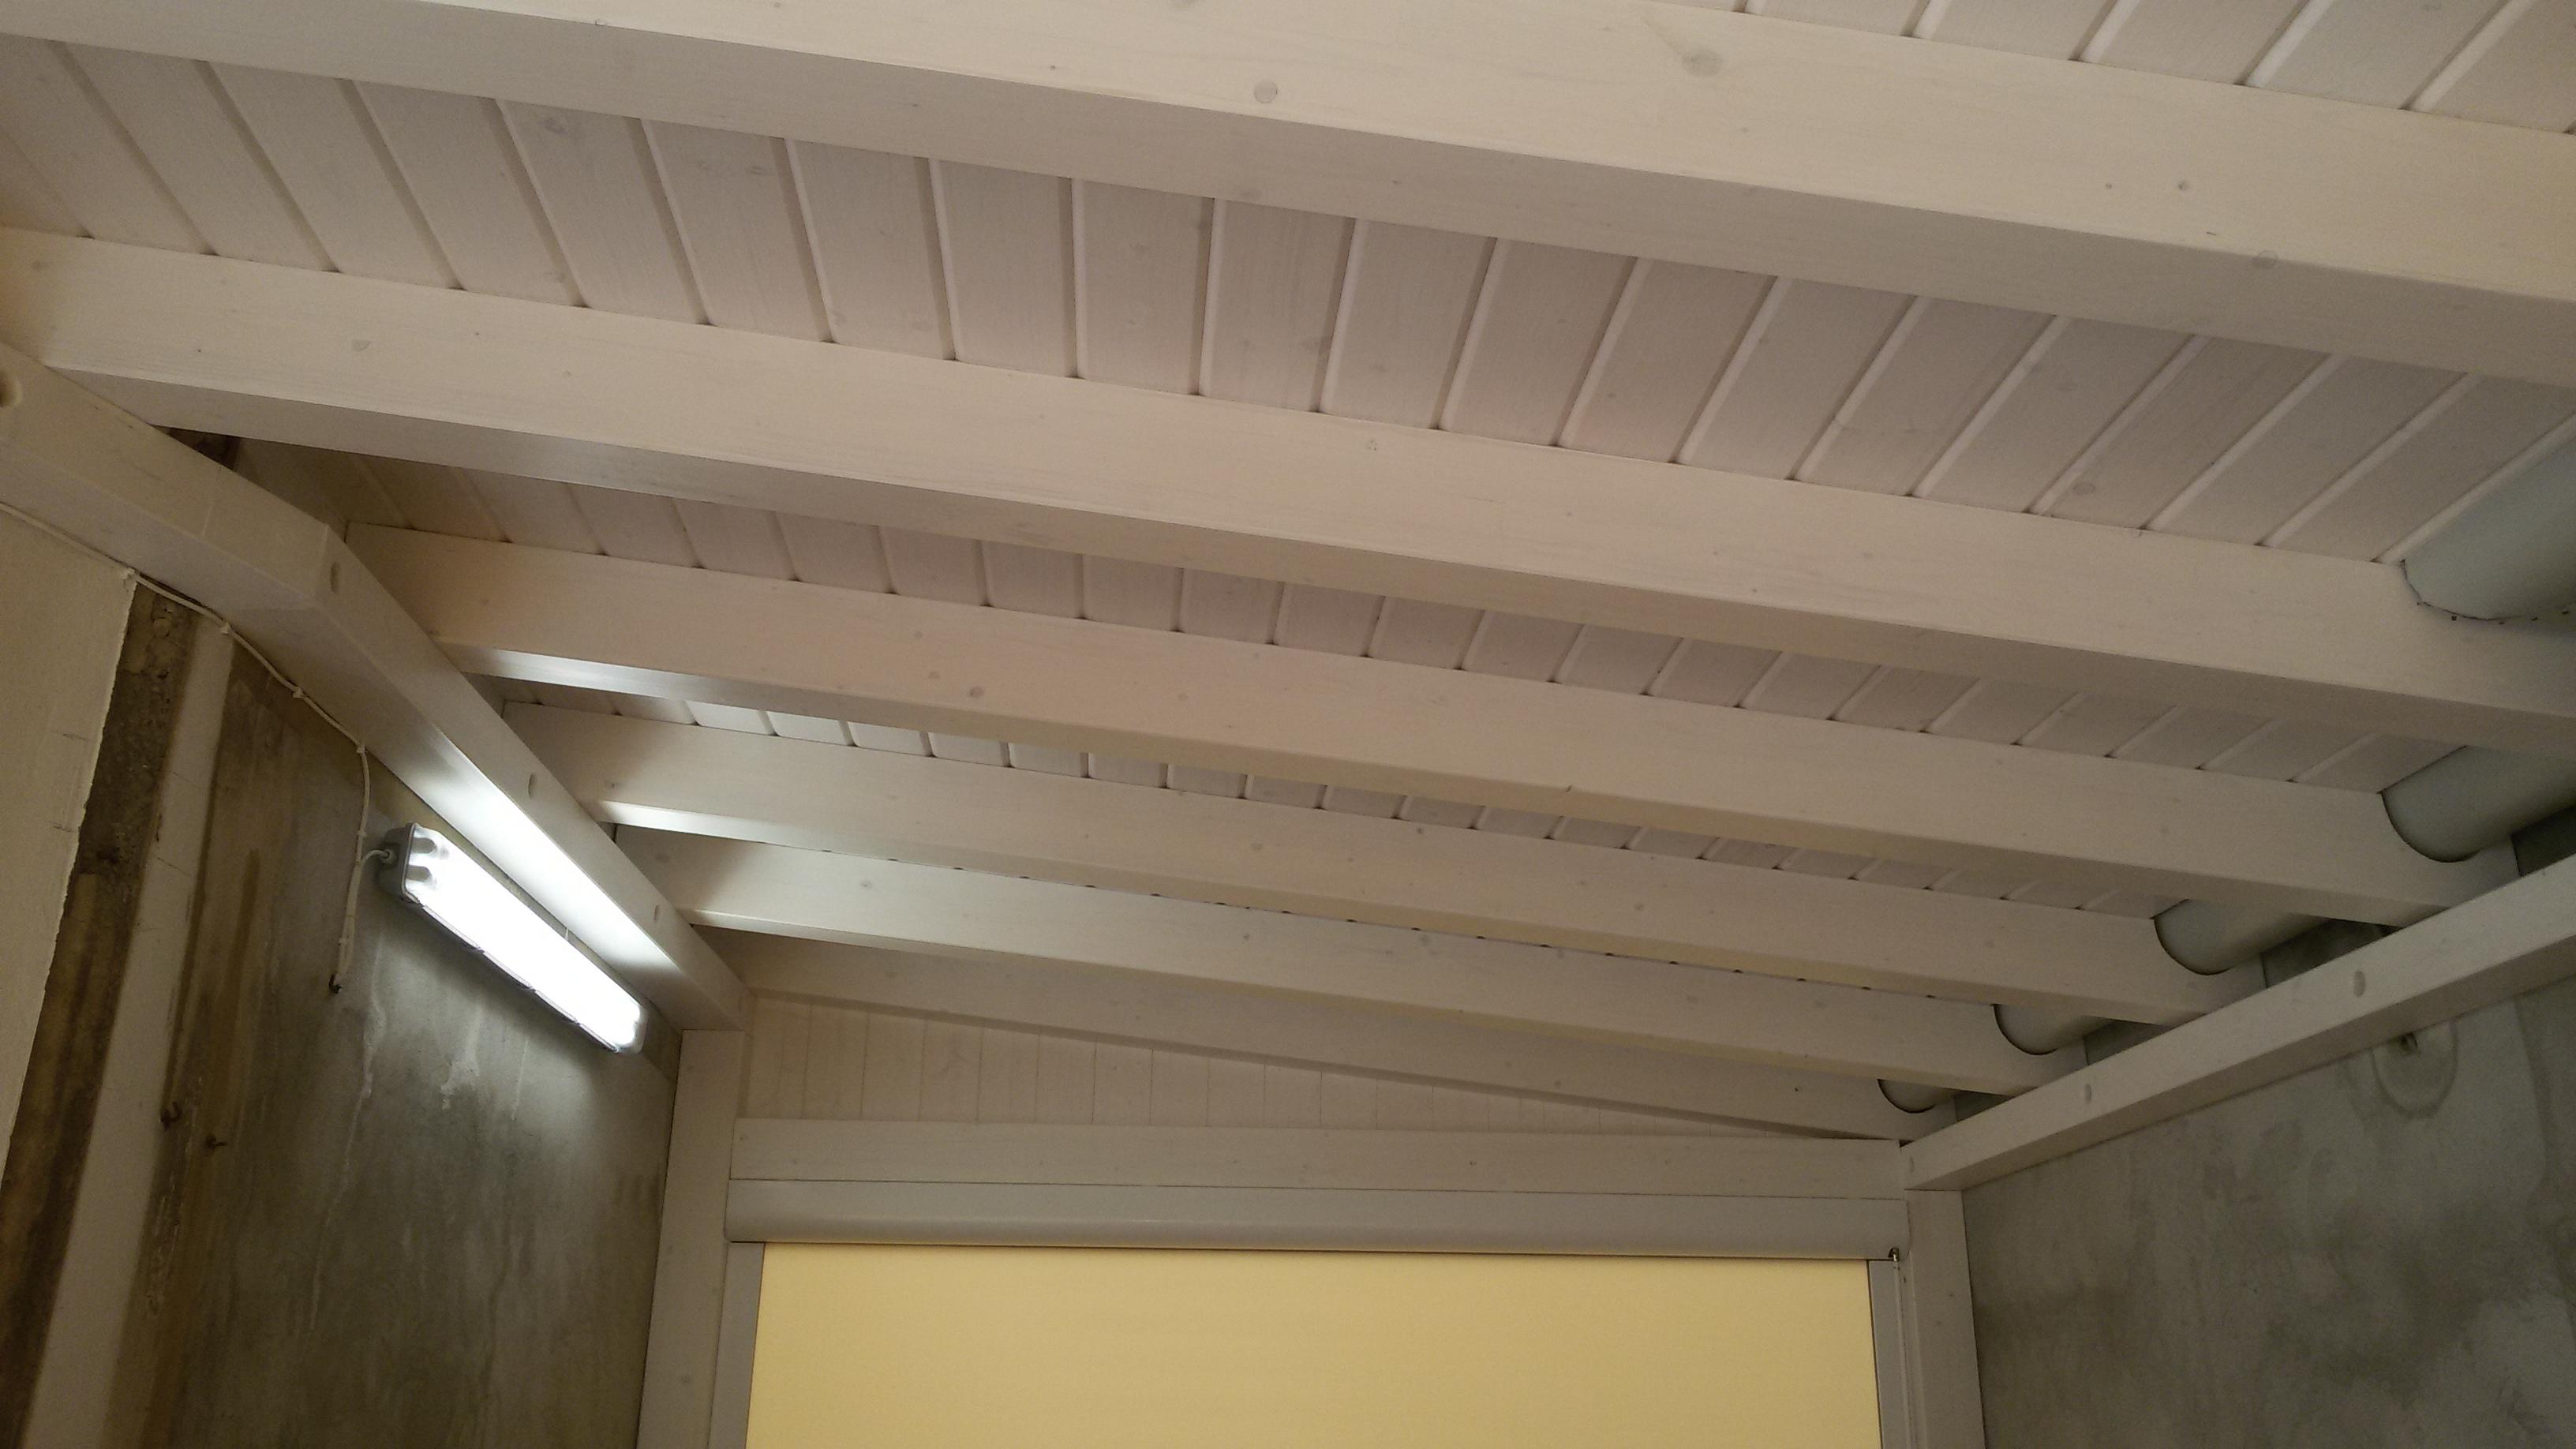 Copertura In Legno Bianco : Copertura in legno bianco e chiusure con tende zip